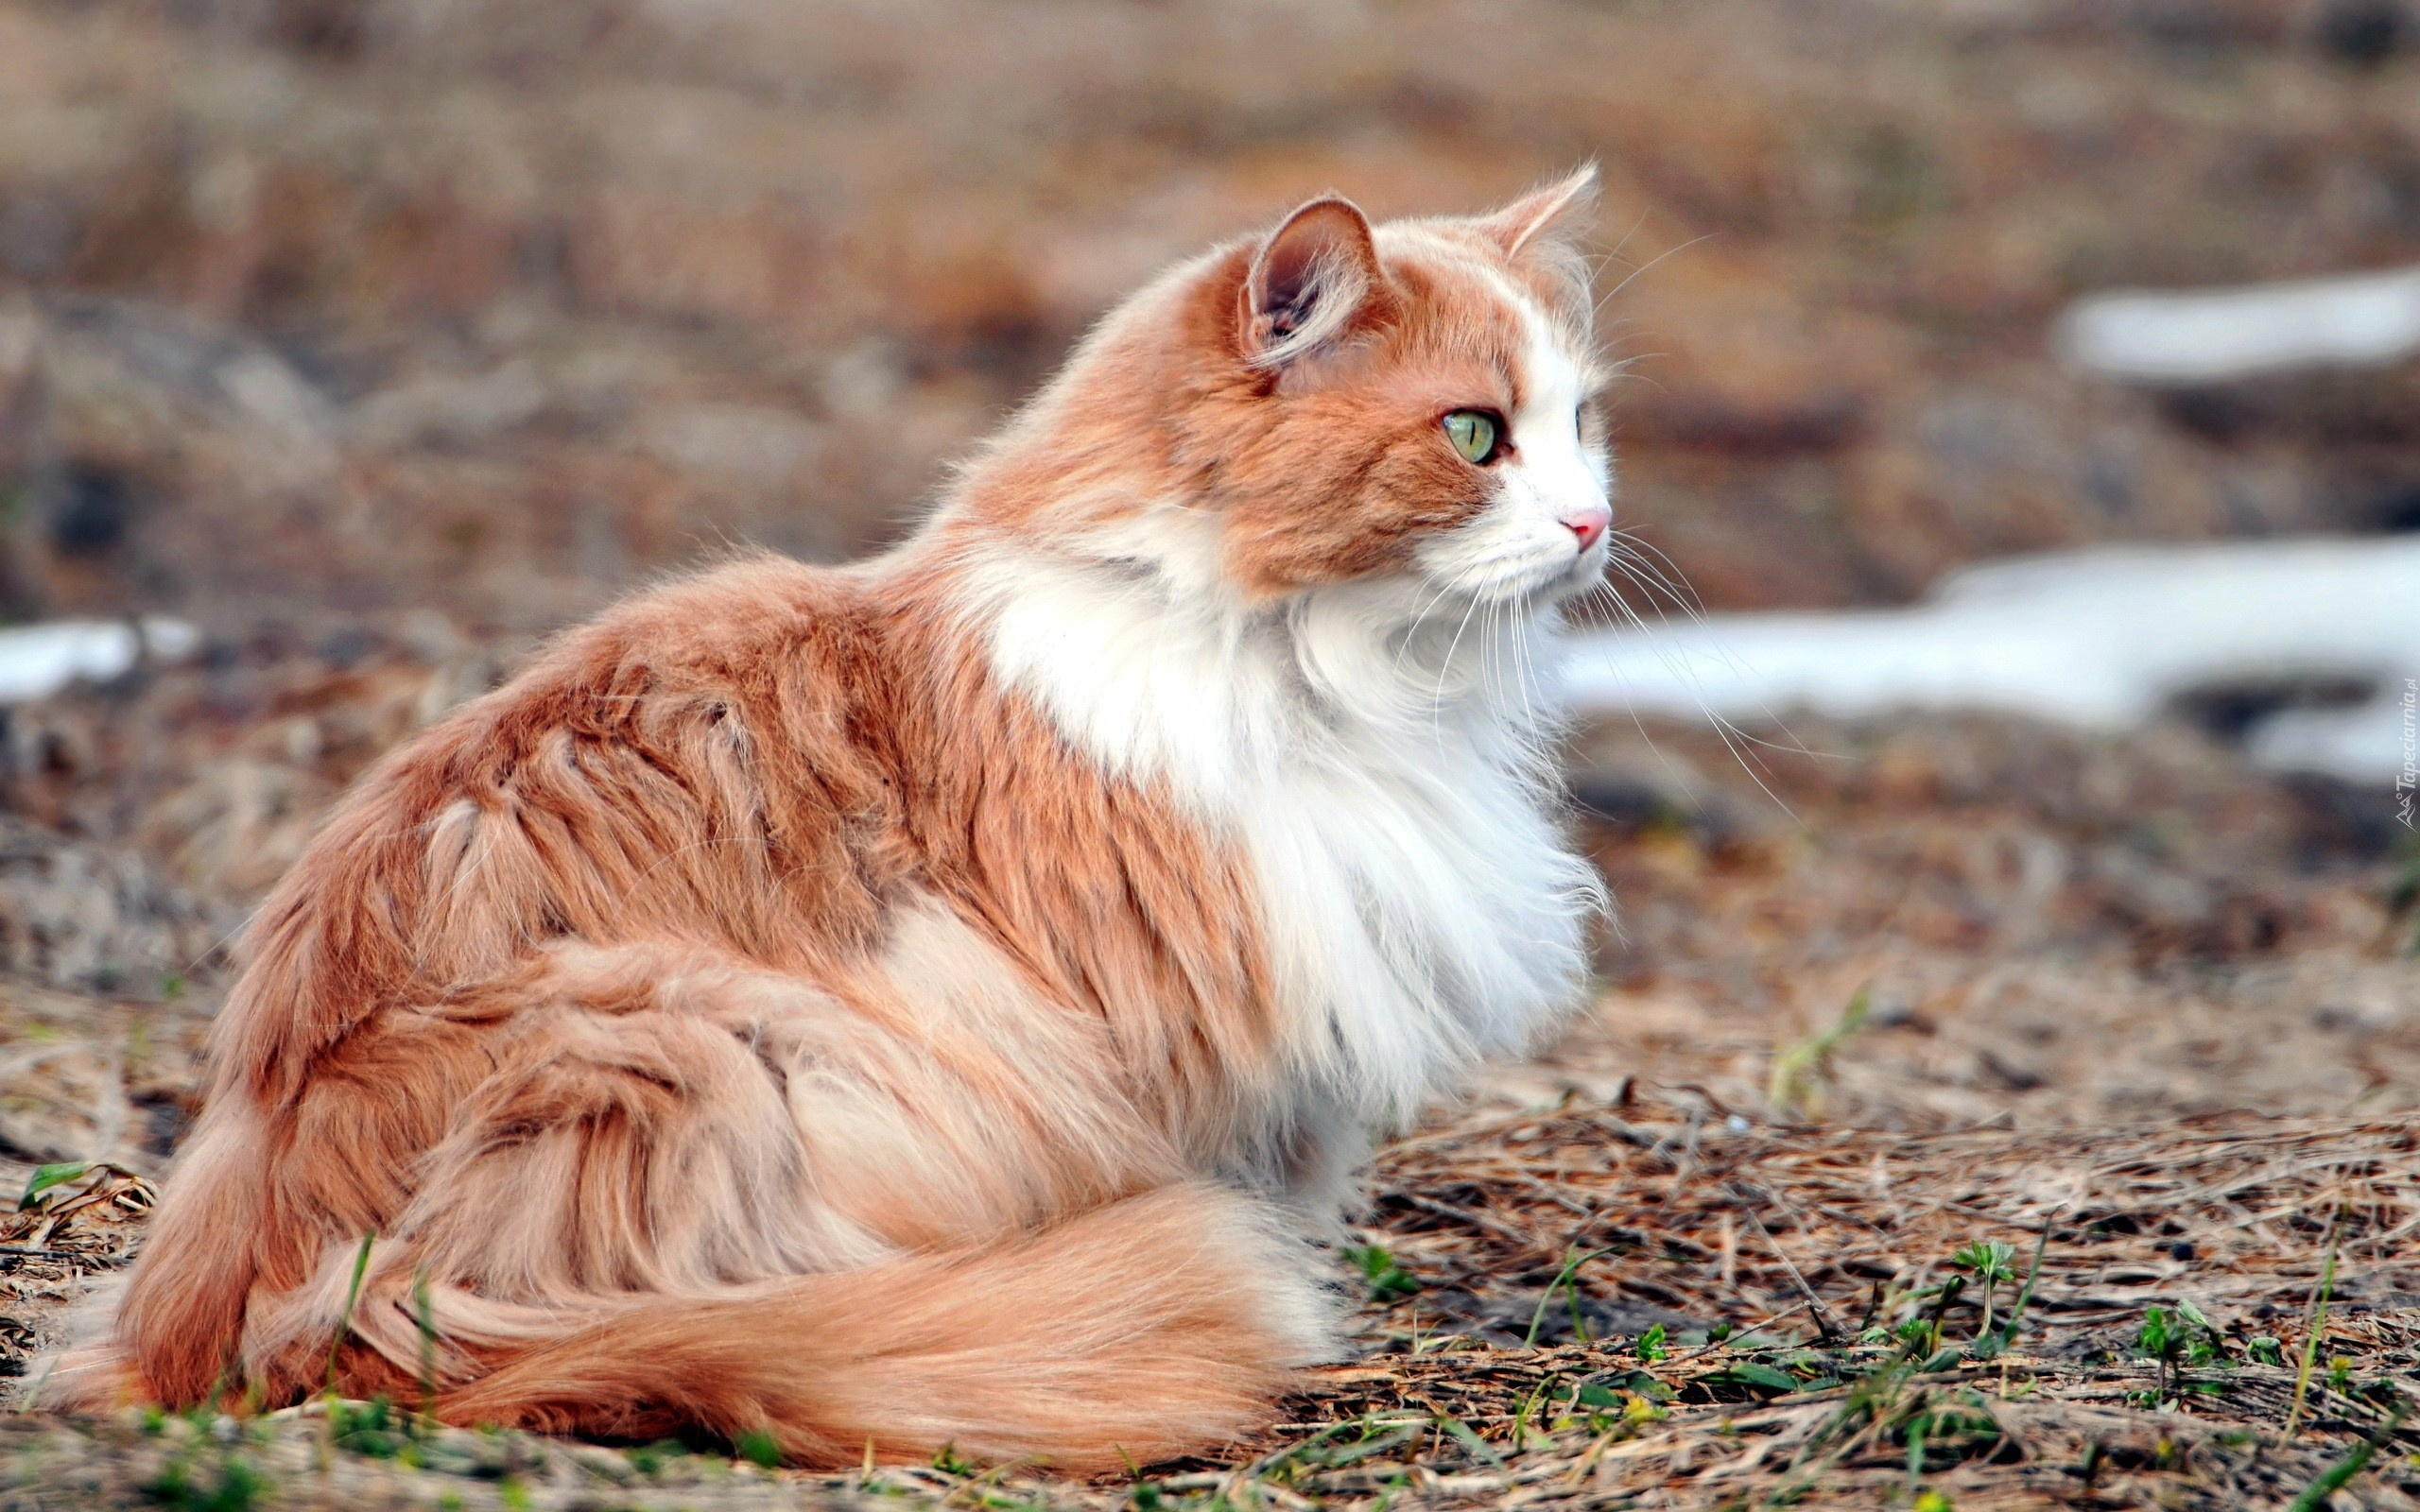 Fall Kitten Wallpaper Ładny Rudo Biały Kot